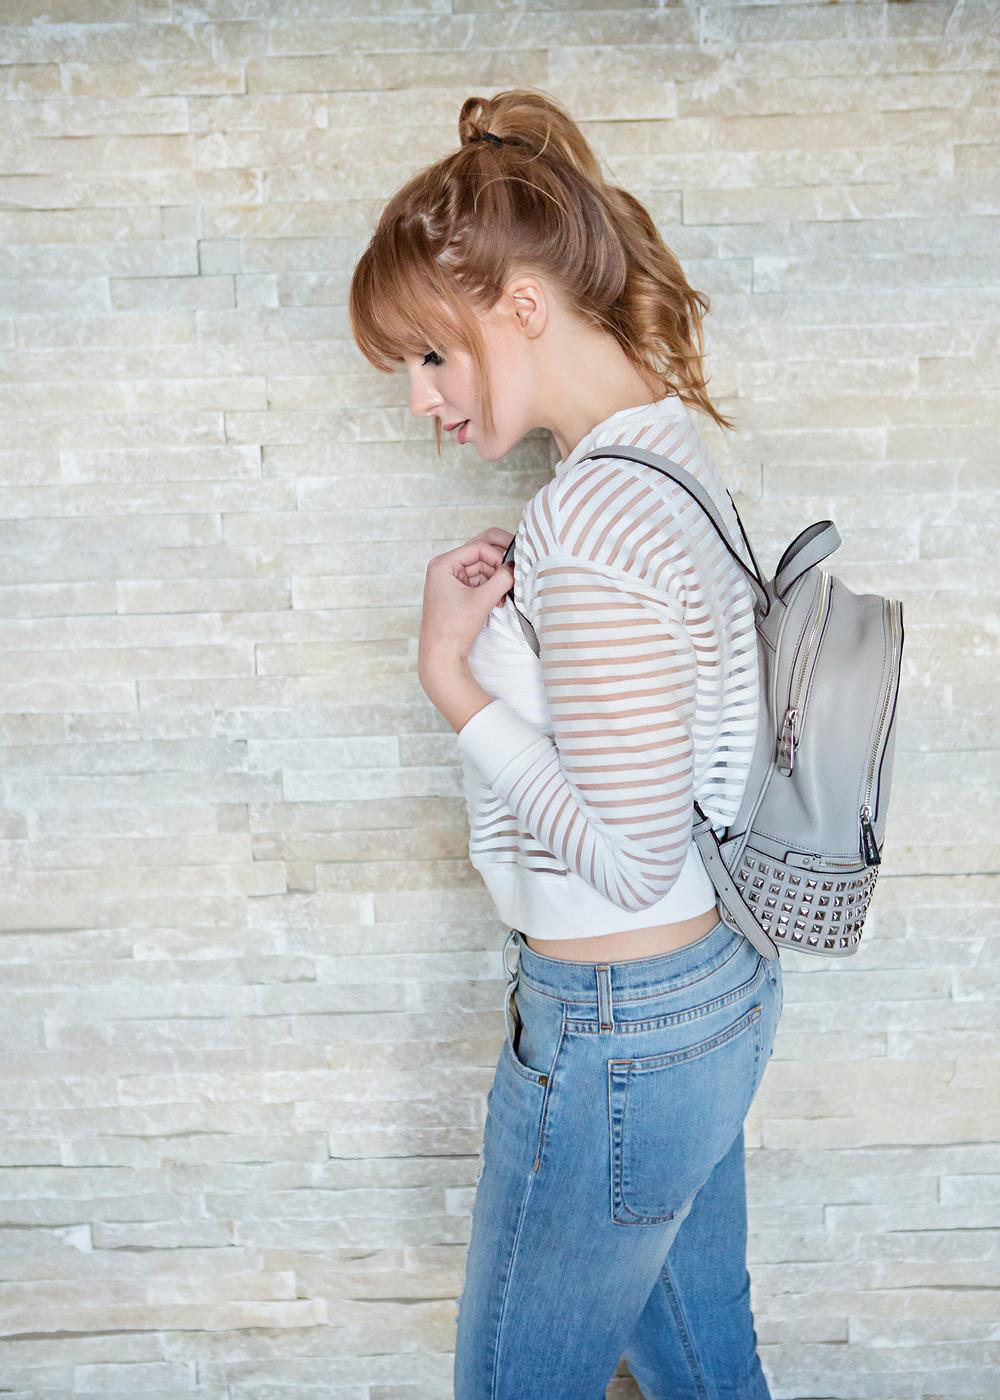 redhead wearing a michael kors backpack